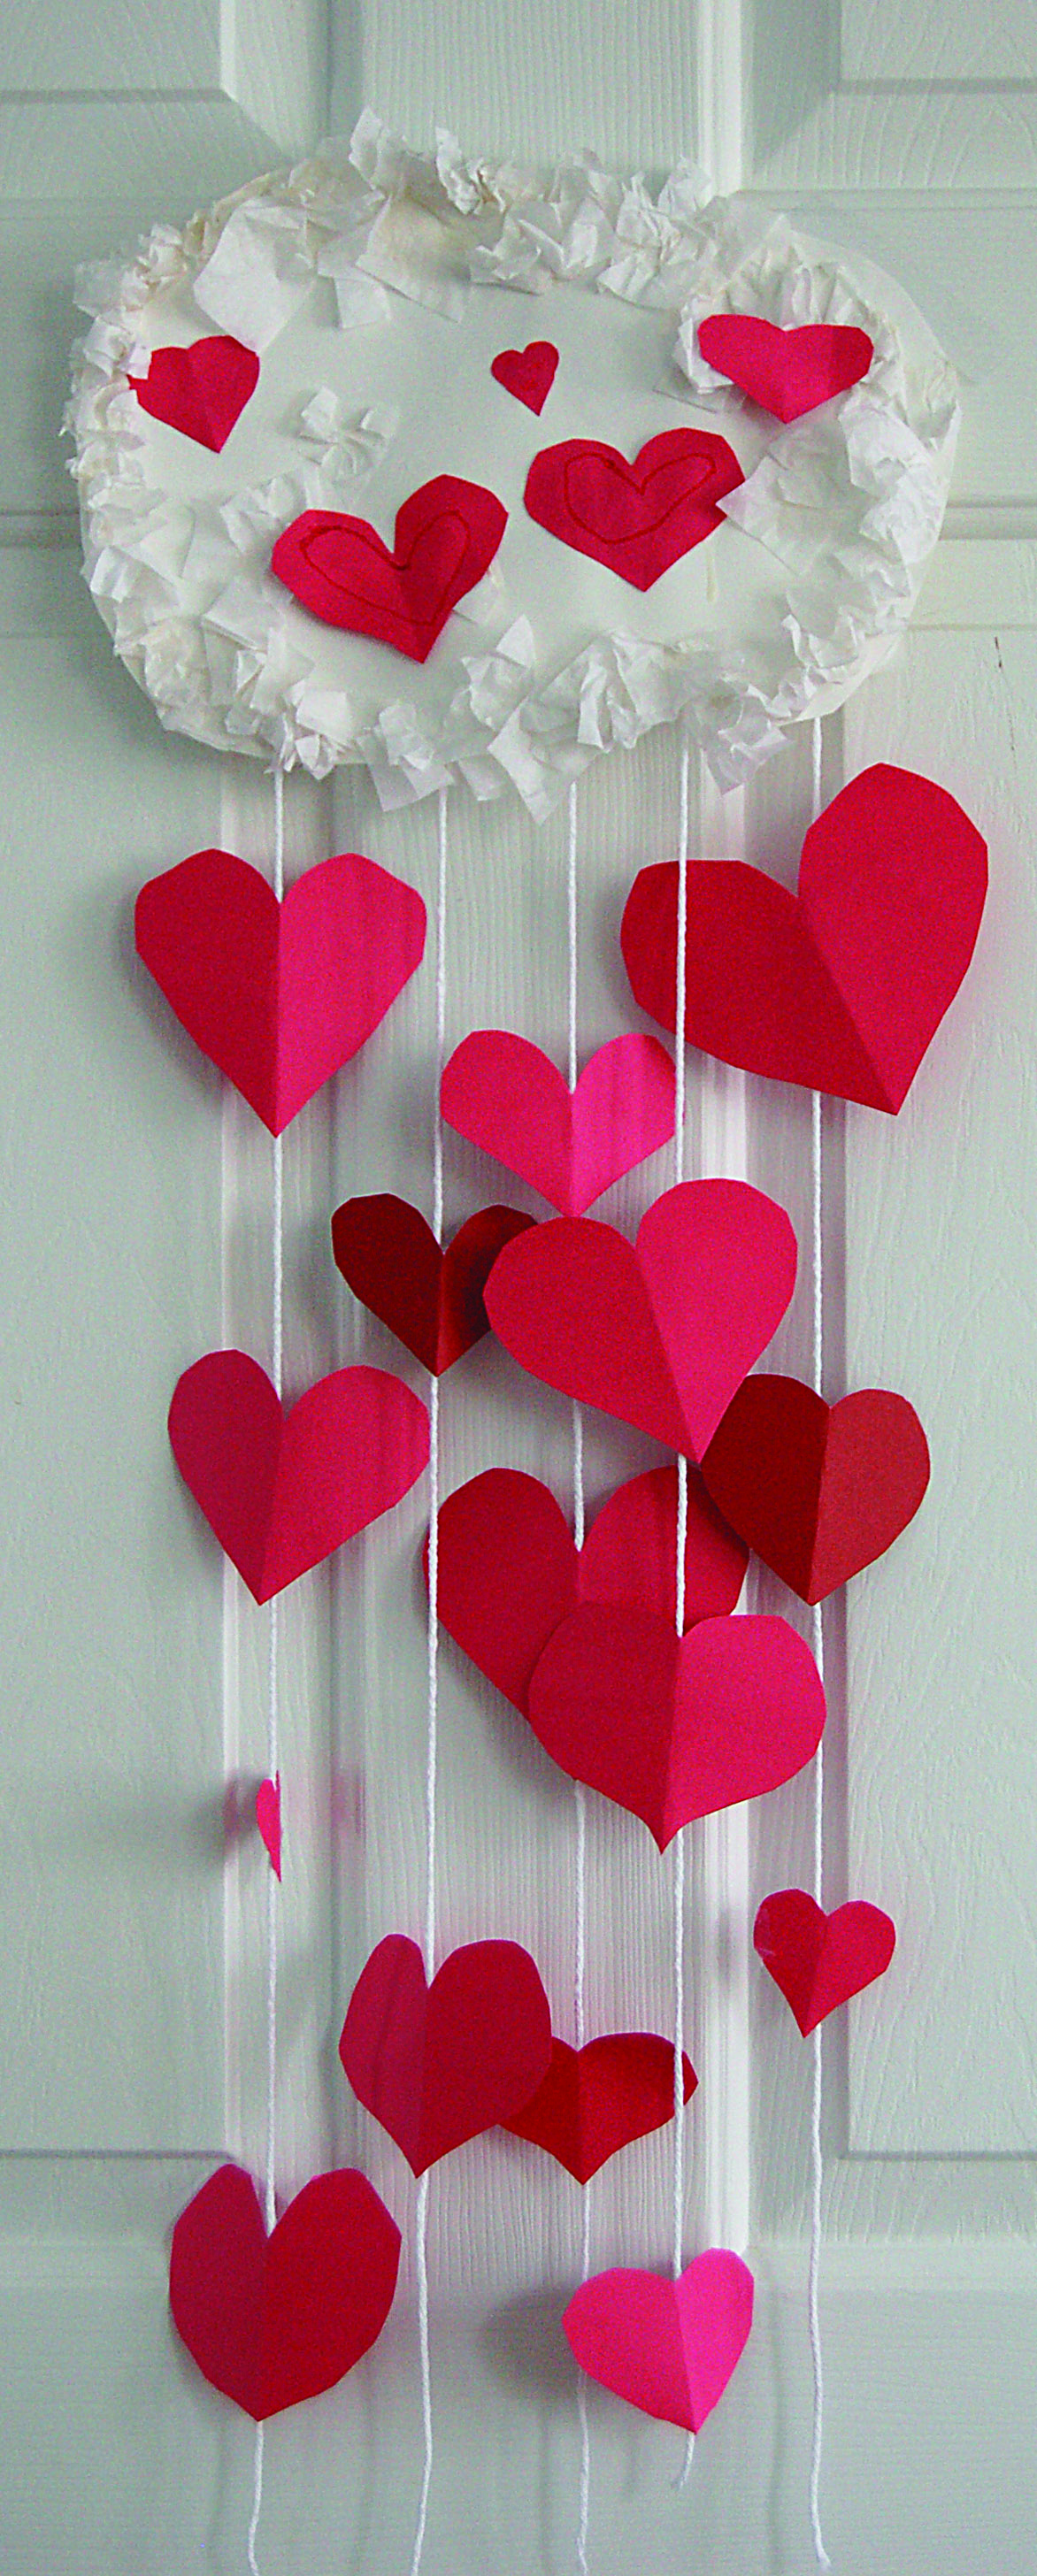 Kids Valentines Day Crafts For Grandparents Suburban Living Magazine